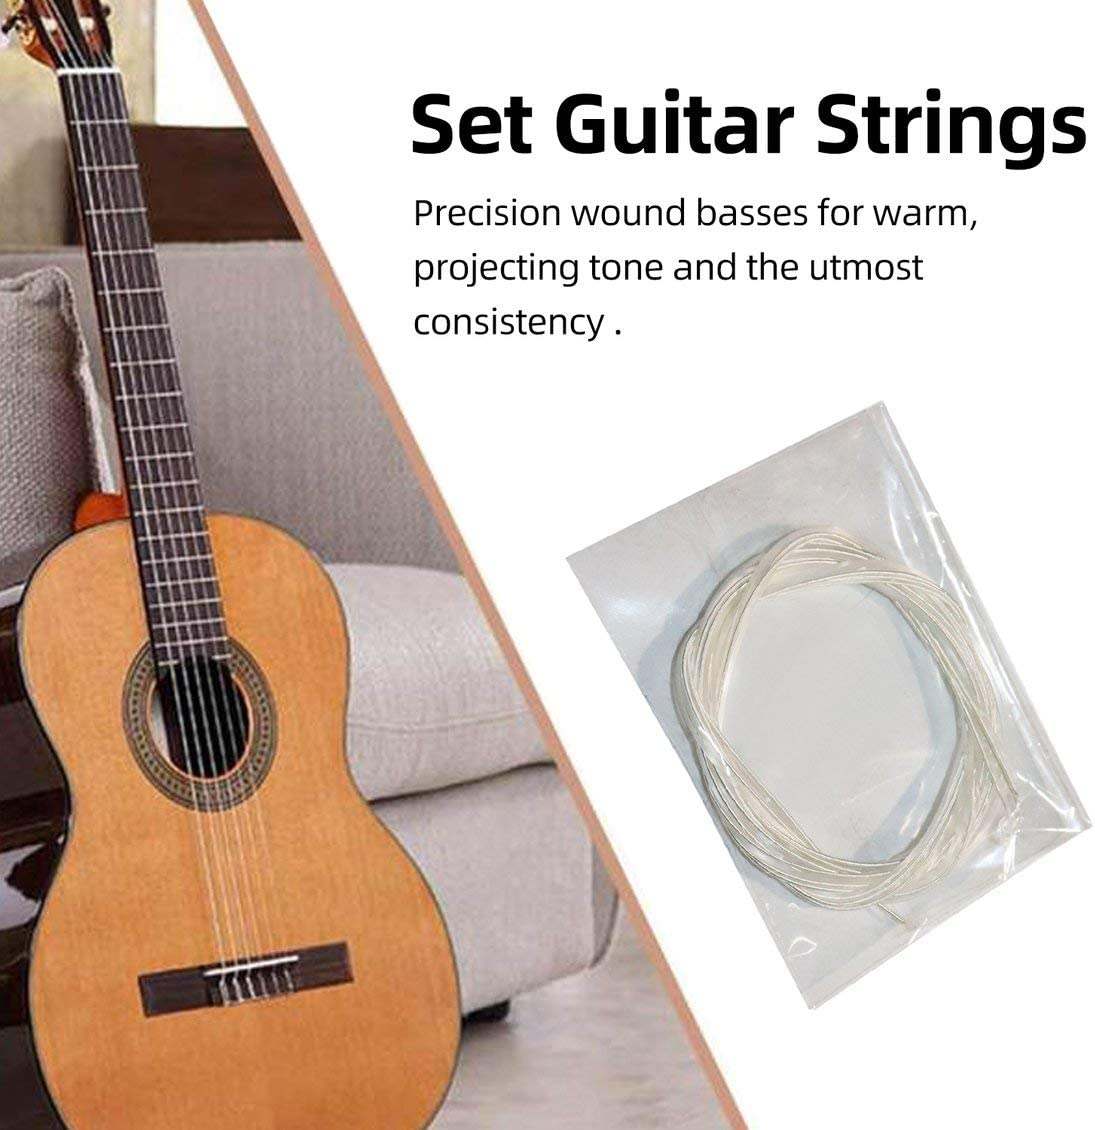 Juego de Cuerdas Plateadas de Nailon Plateado y Transparente Pgige para Guitarra cl/ásica cl/ásica 1M 1-6 EBGDAE Plateado